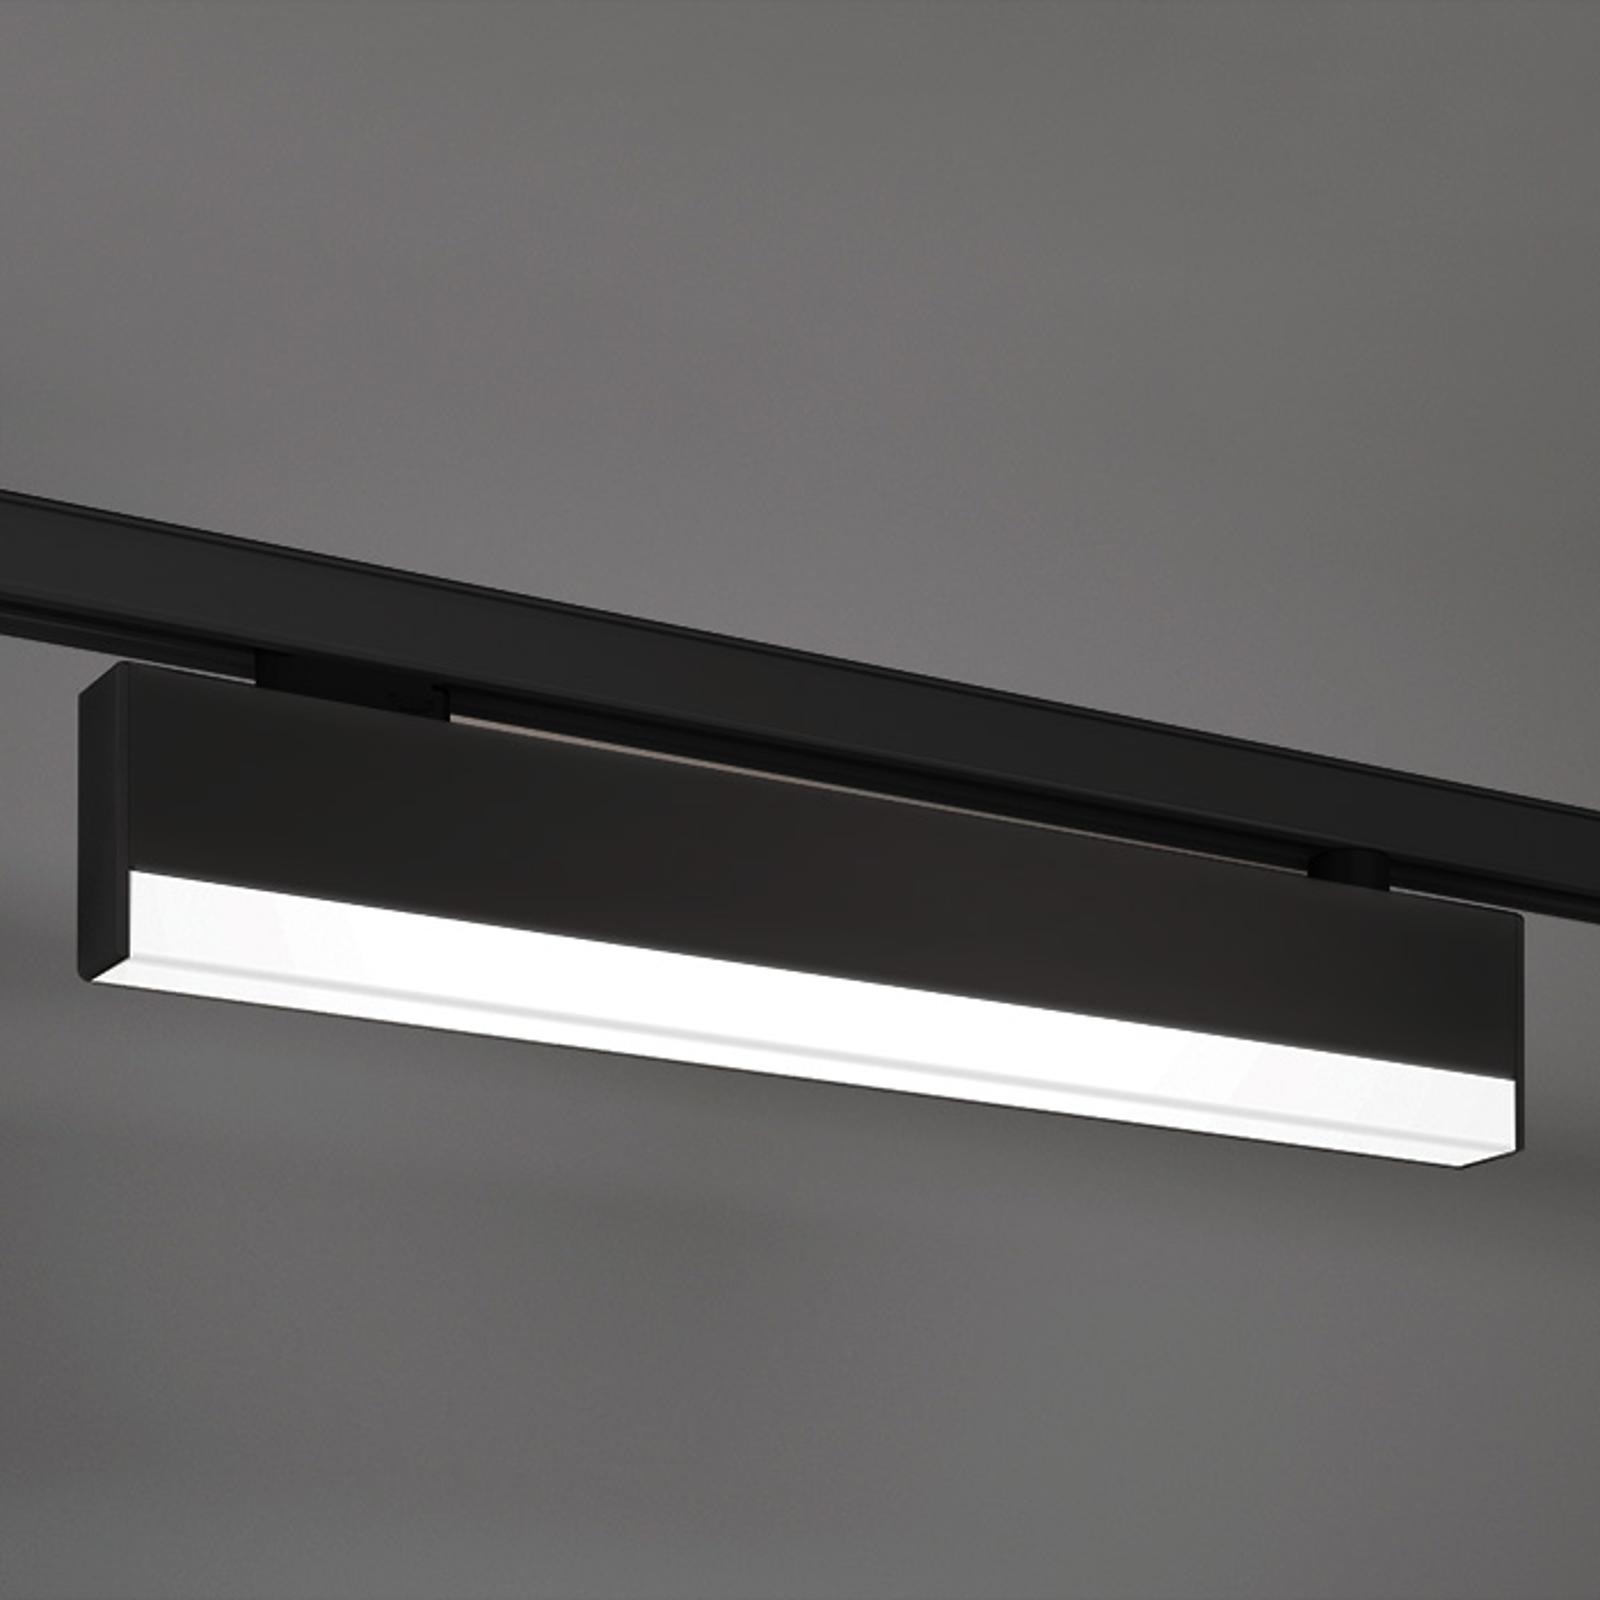 LED-lampe til 3-fase skinne, sort